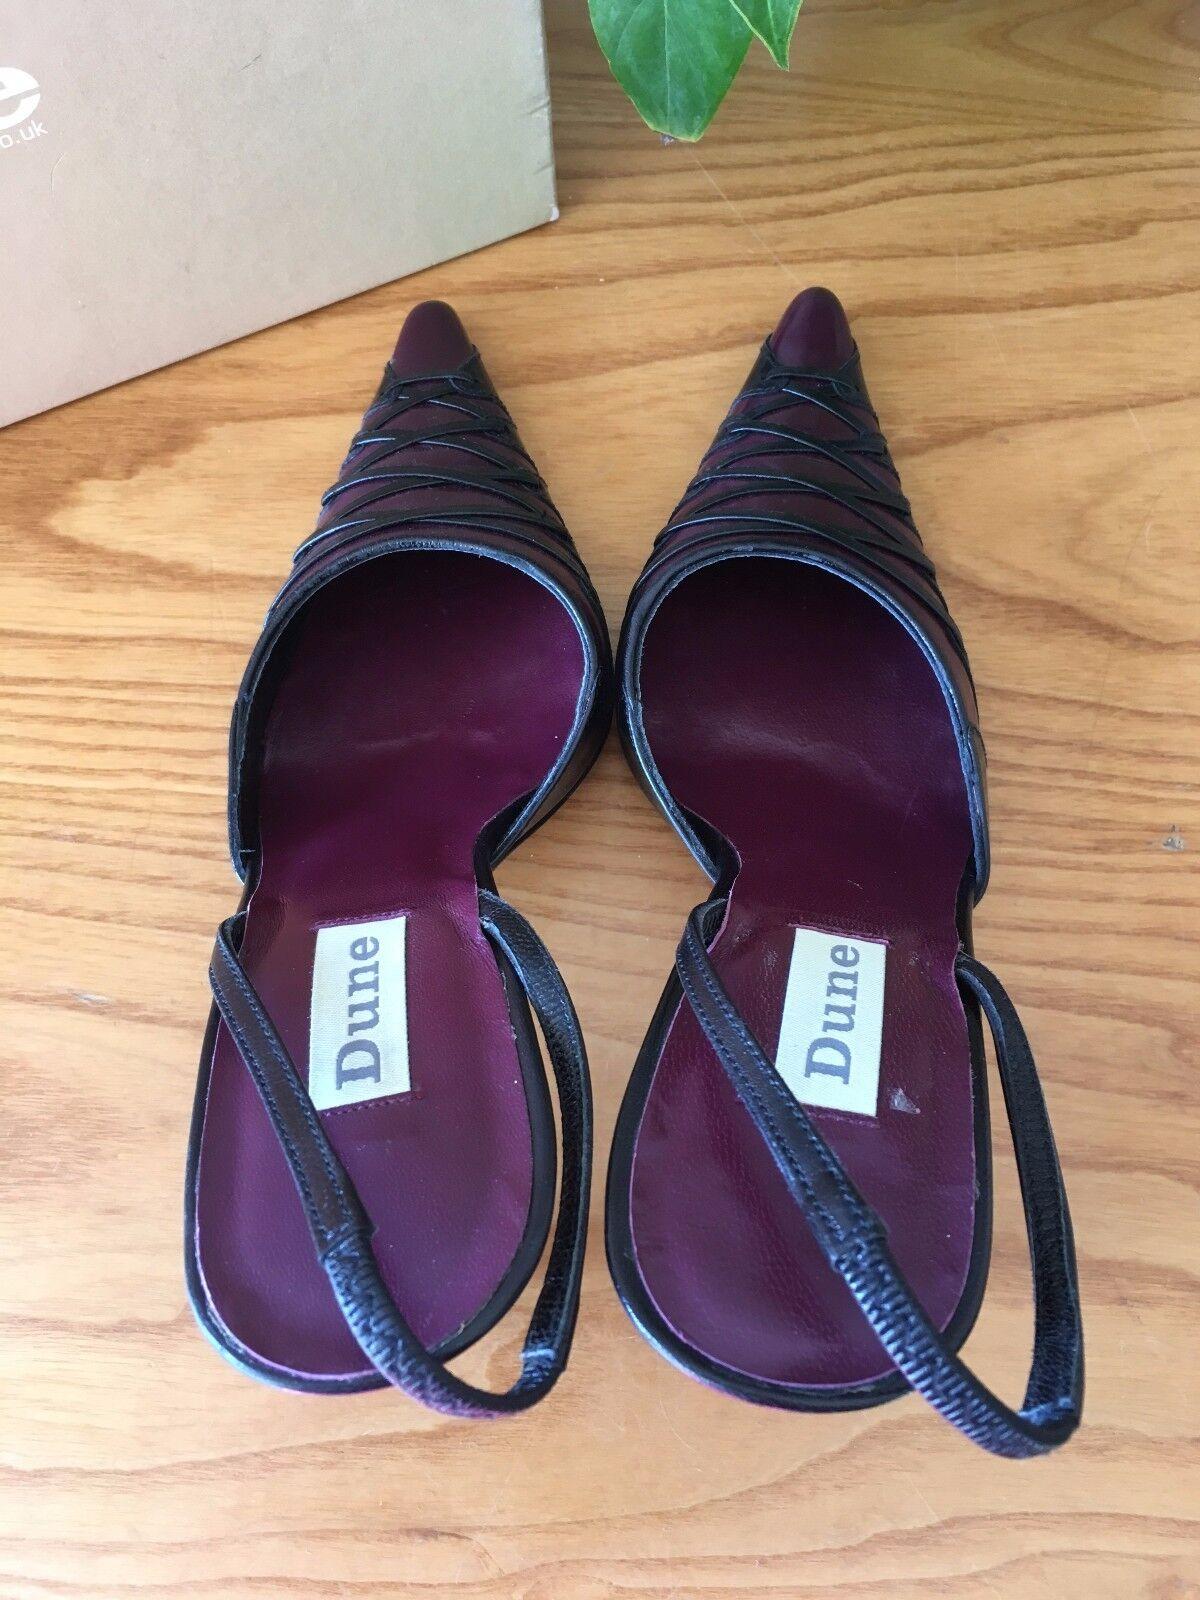 Dune detail purple black corset laced detail Dune slingback pointed court shoes UK 3 EU 36 3679e6